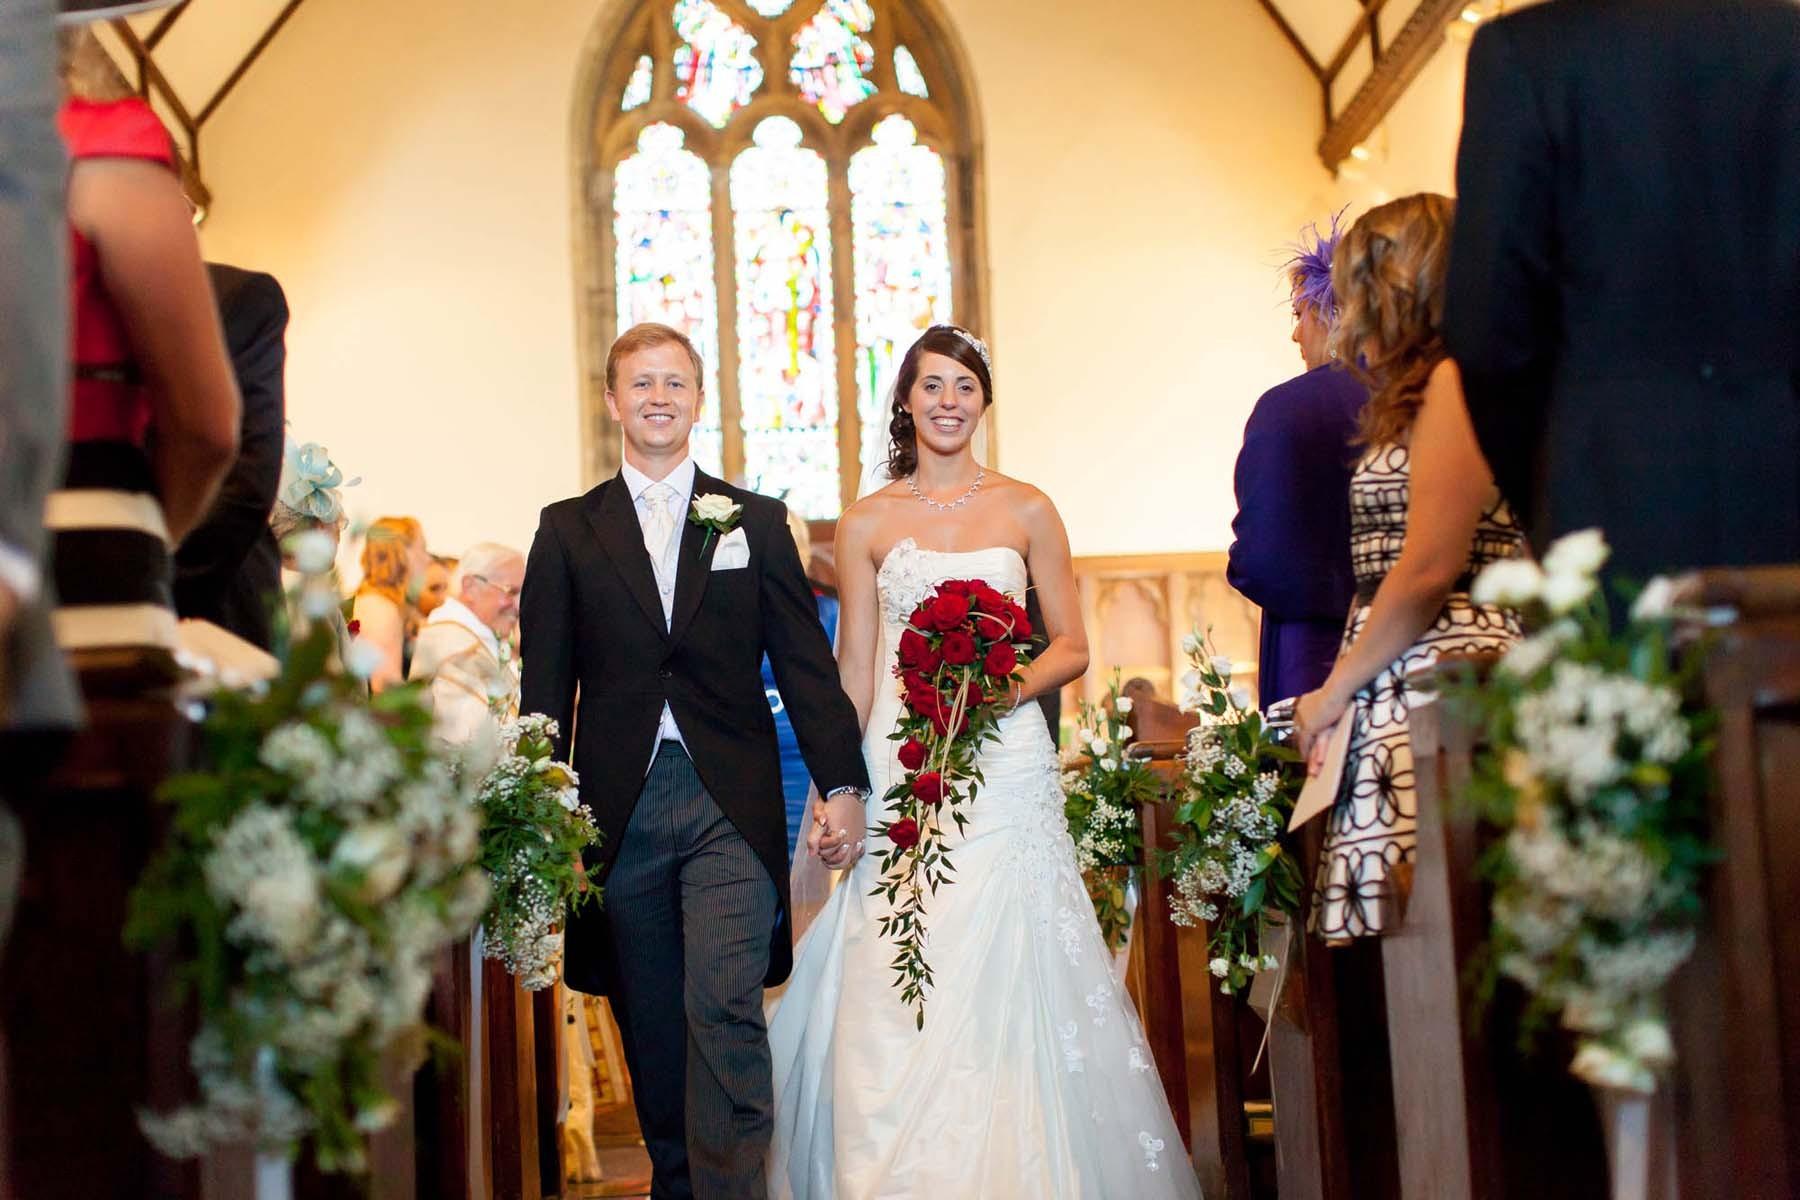 Sussex & Surrey Wedding Photographer - Ceremony (21)